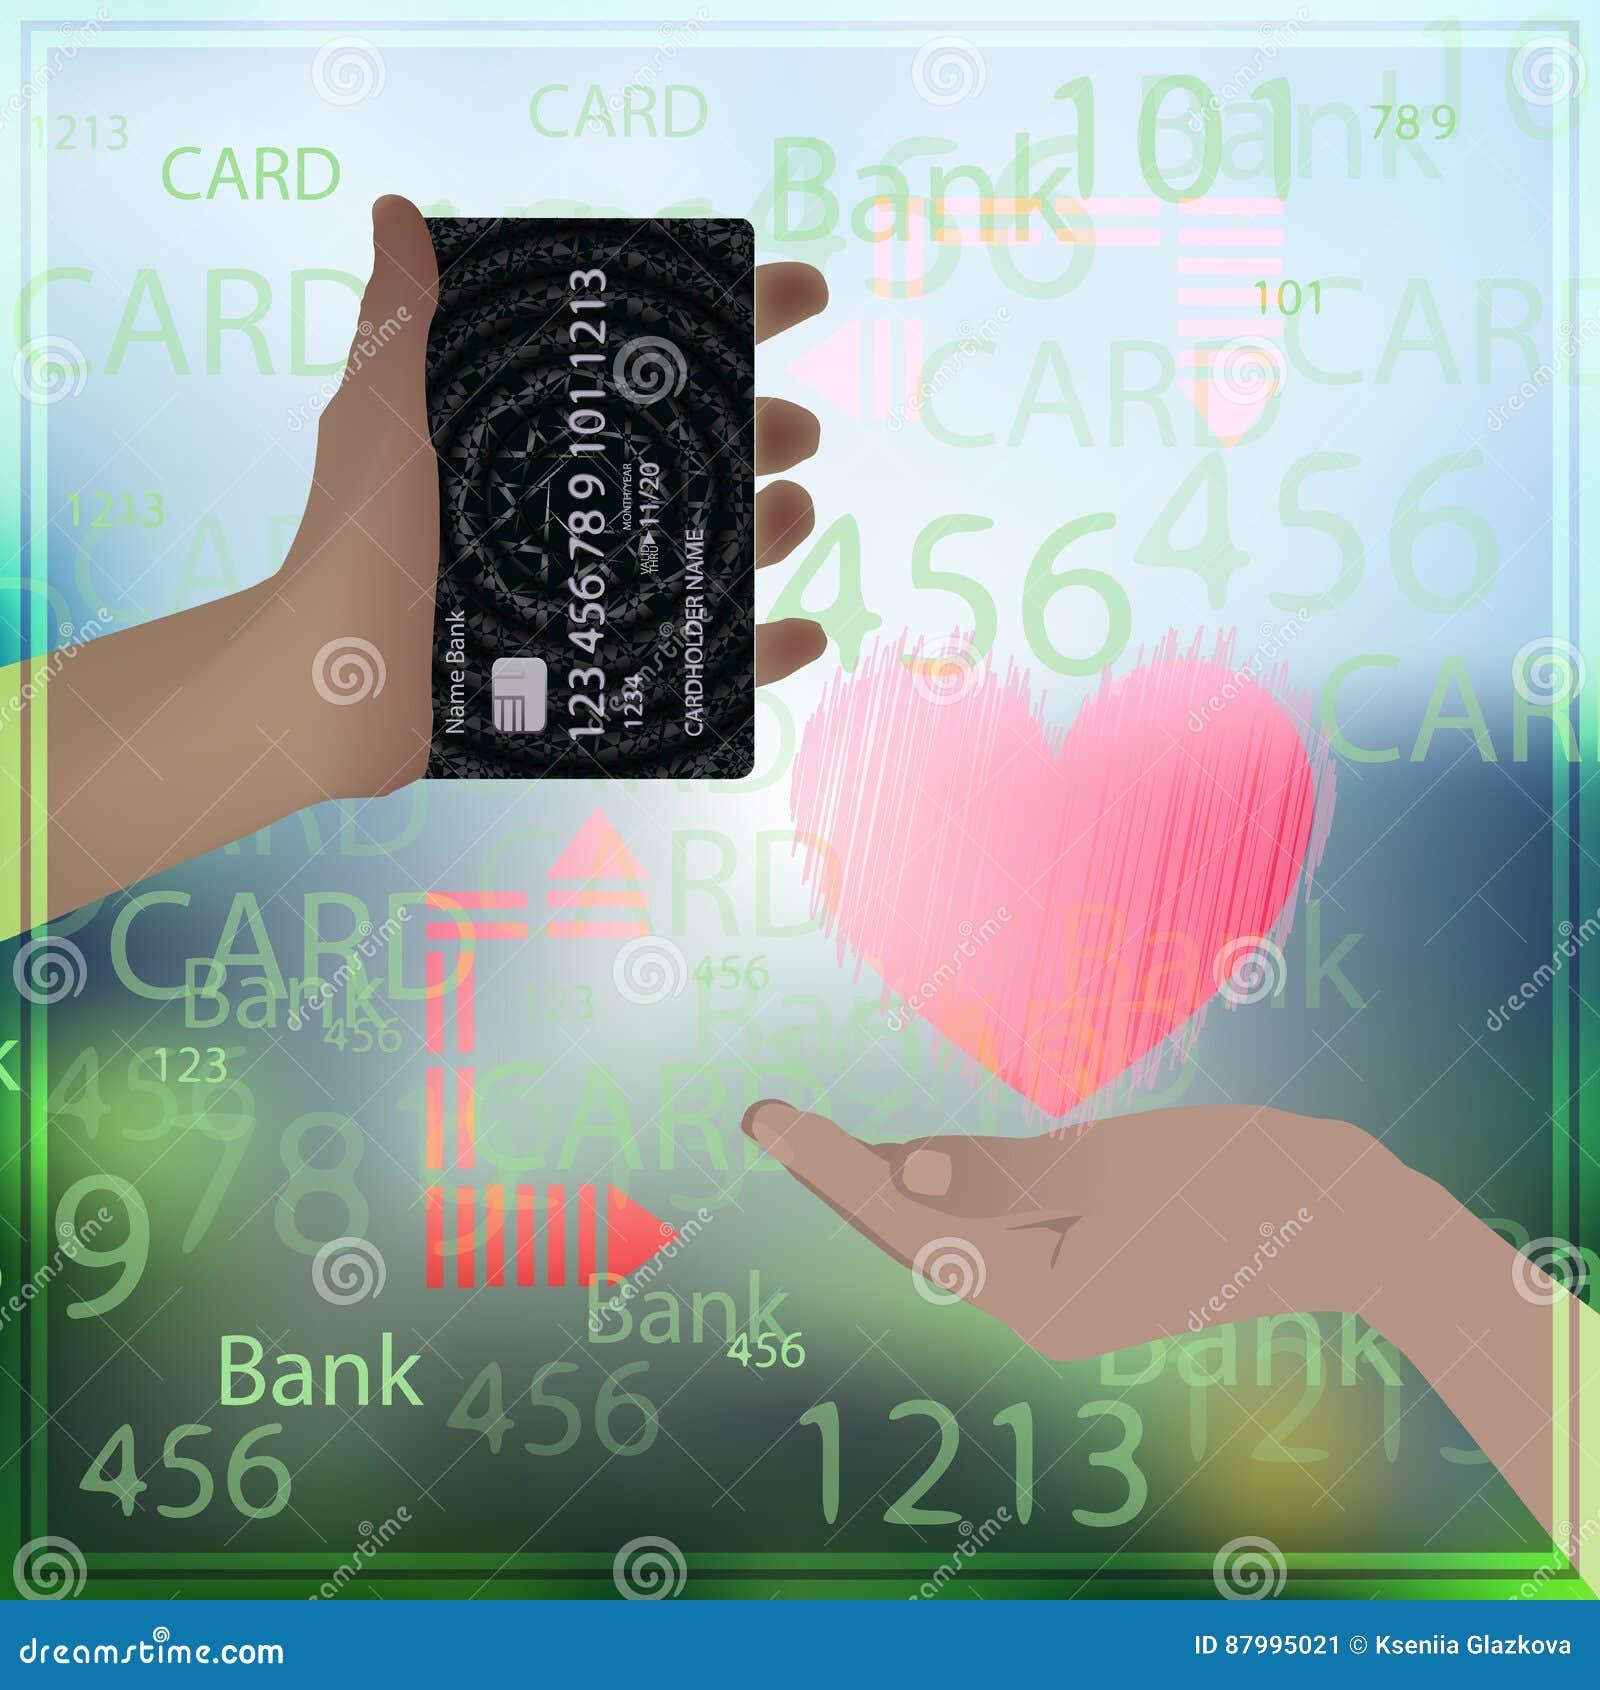 Design Bank Sale.Bank Card Sale Love Prostitution Heart Photo Background Stock